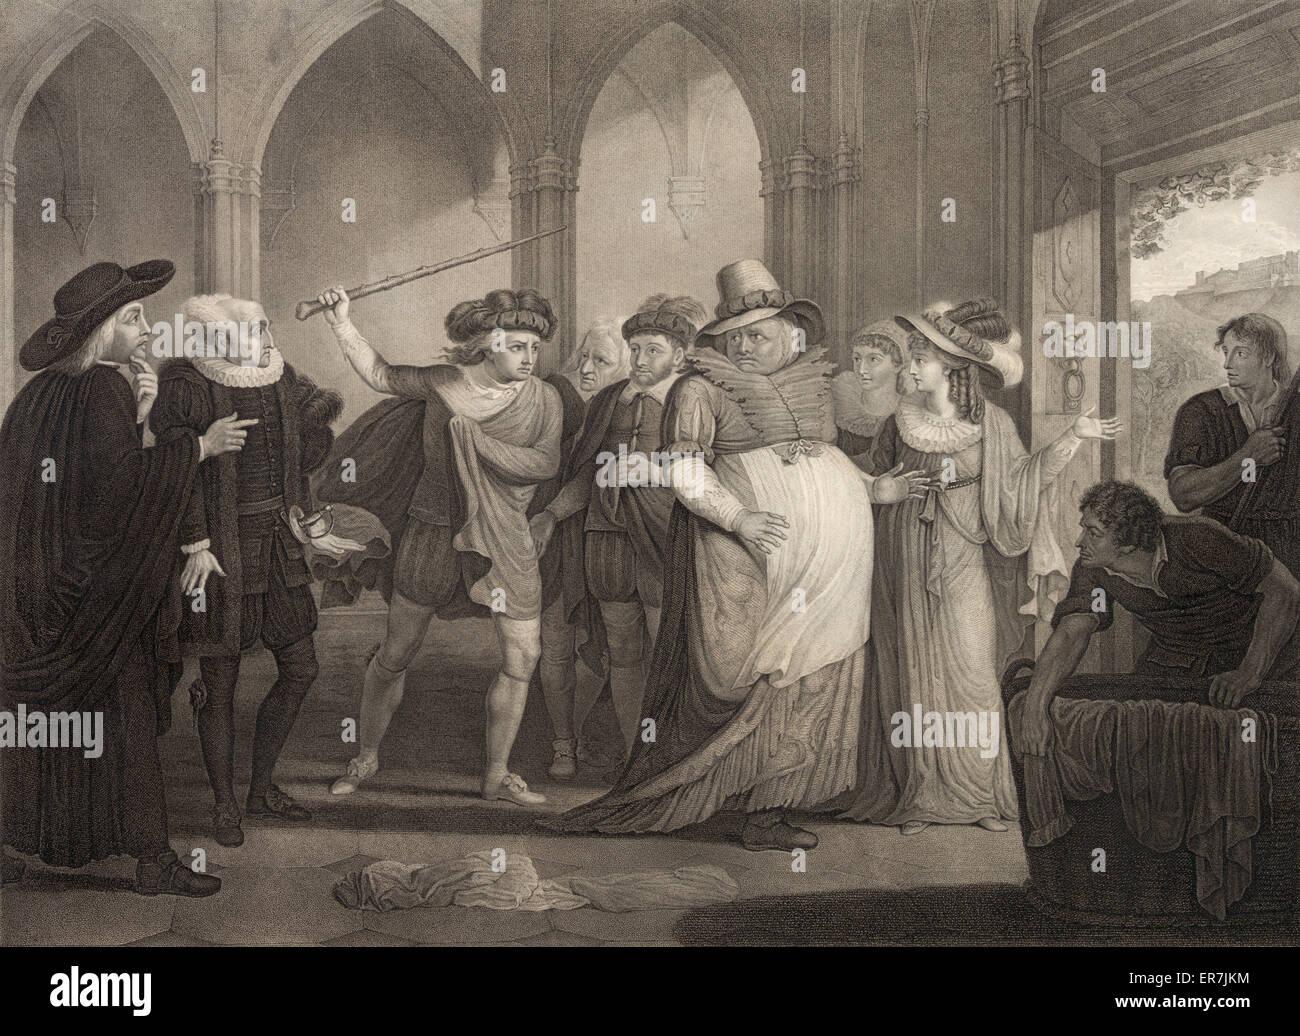 Shakspeare., Merry Wives of Windsor., Act IV. scene II - Stock Image